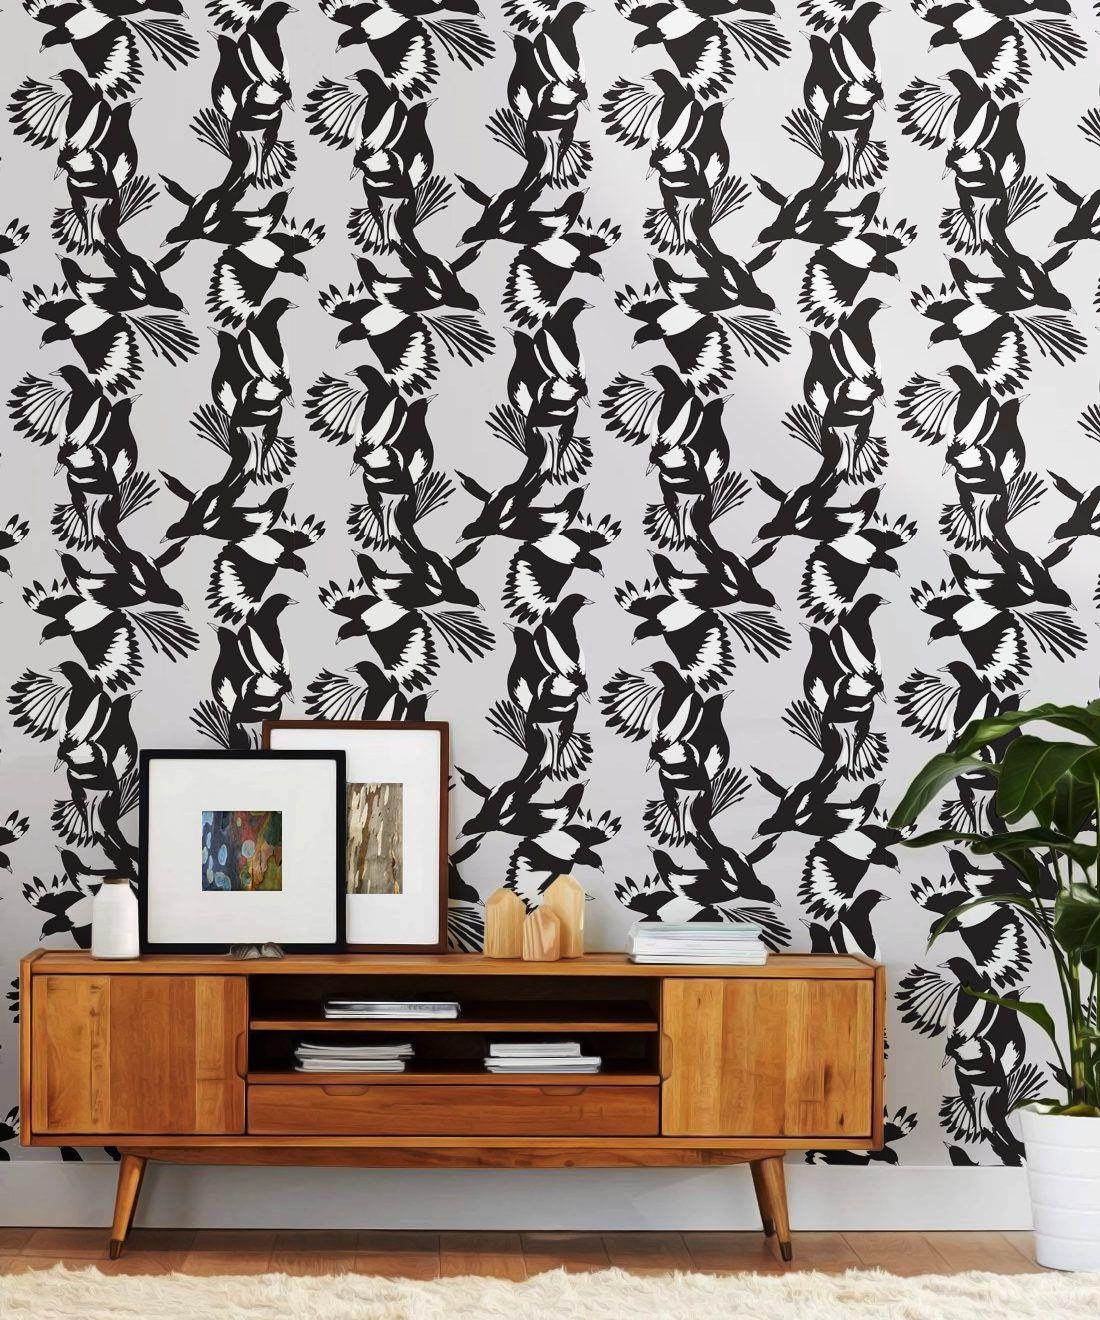 Magpie Wallpaper • Milton & King USA • Black & White Wallpaper Insitu